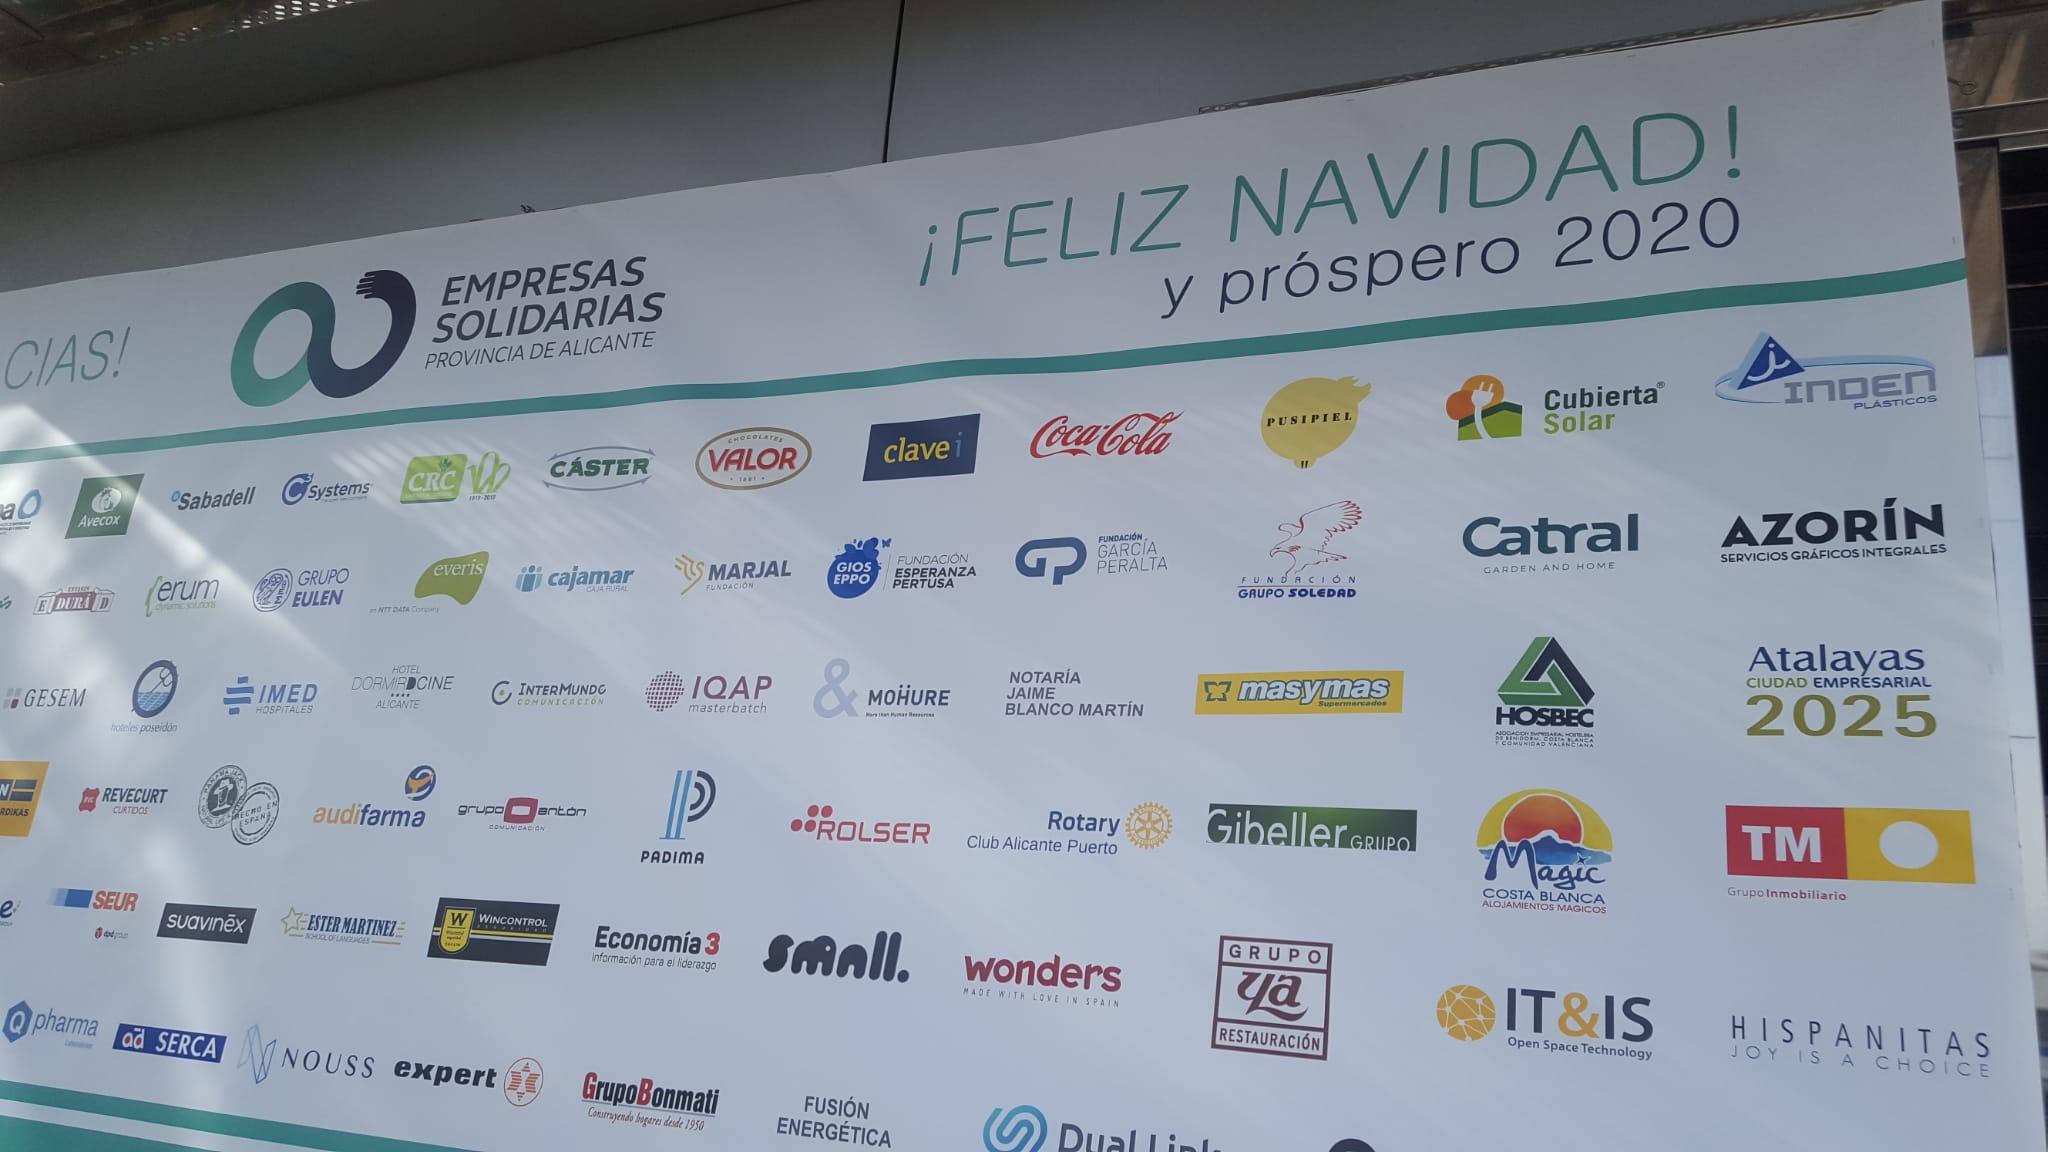 marcas colaboradoras en empresas solidarias